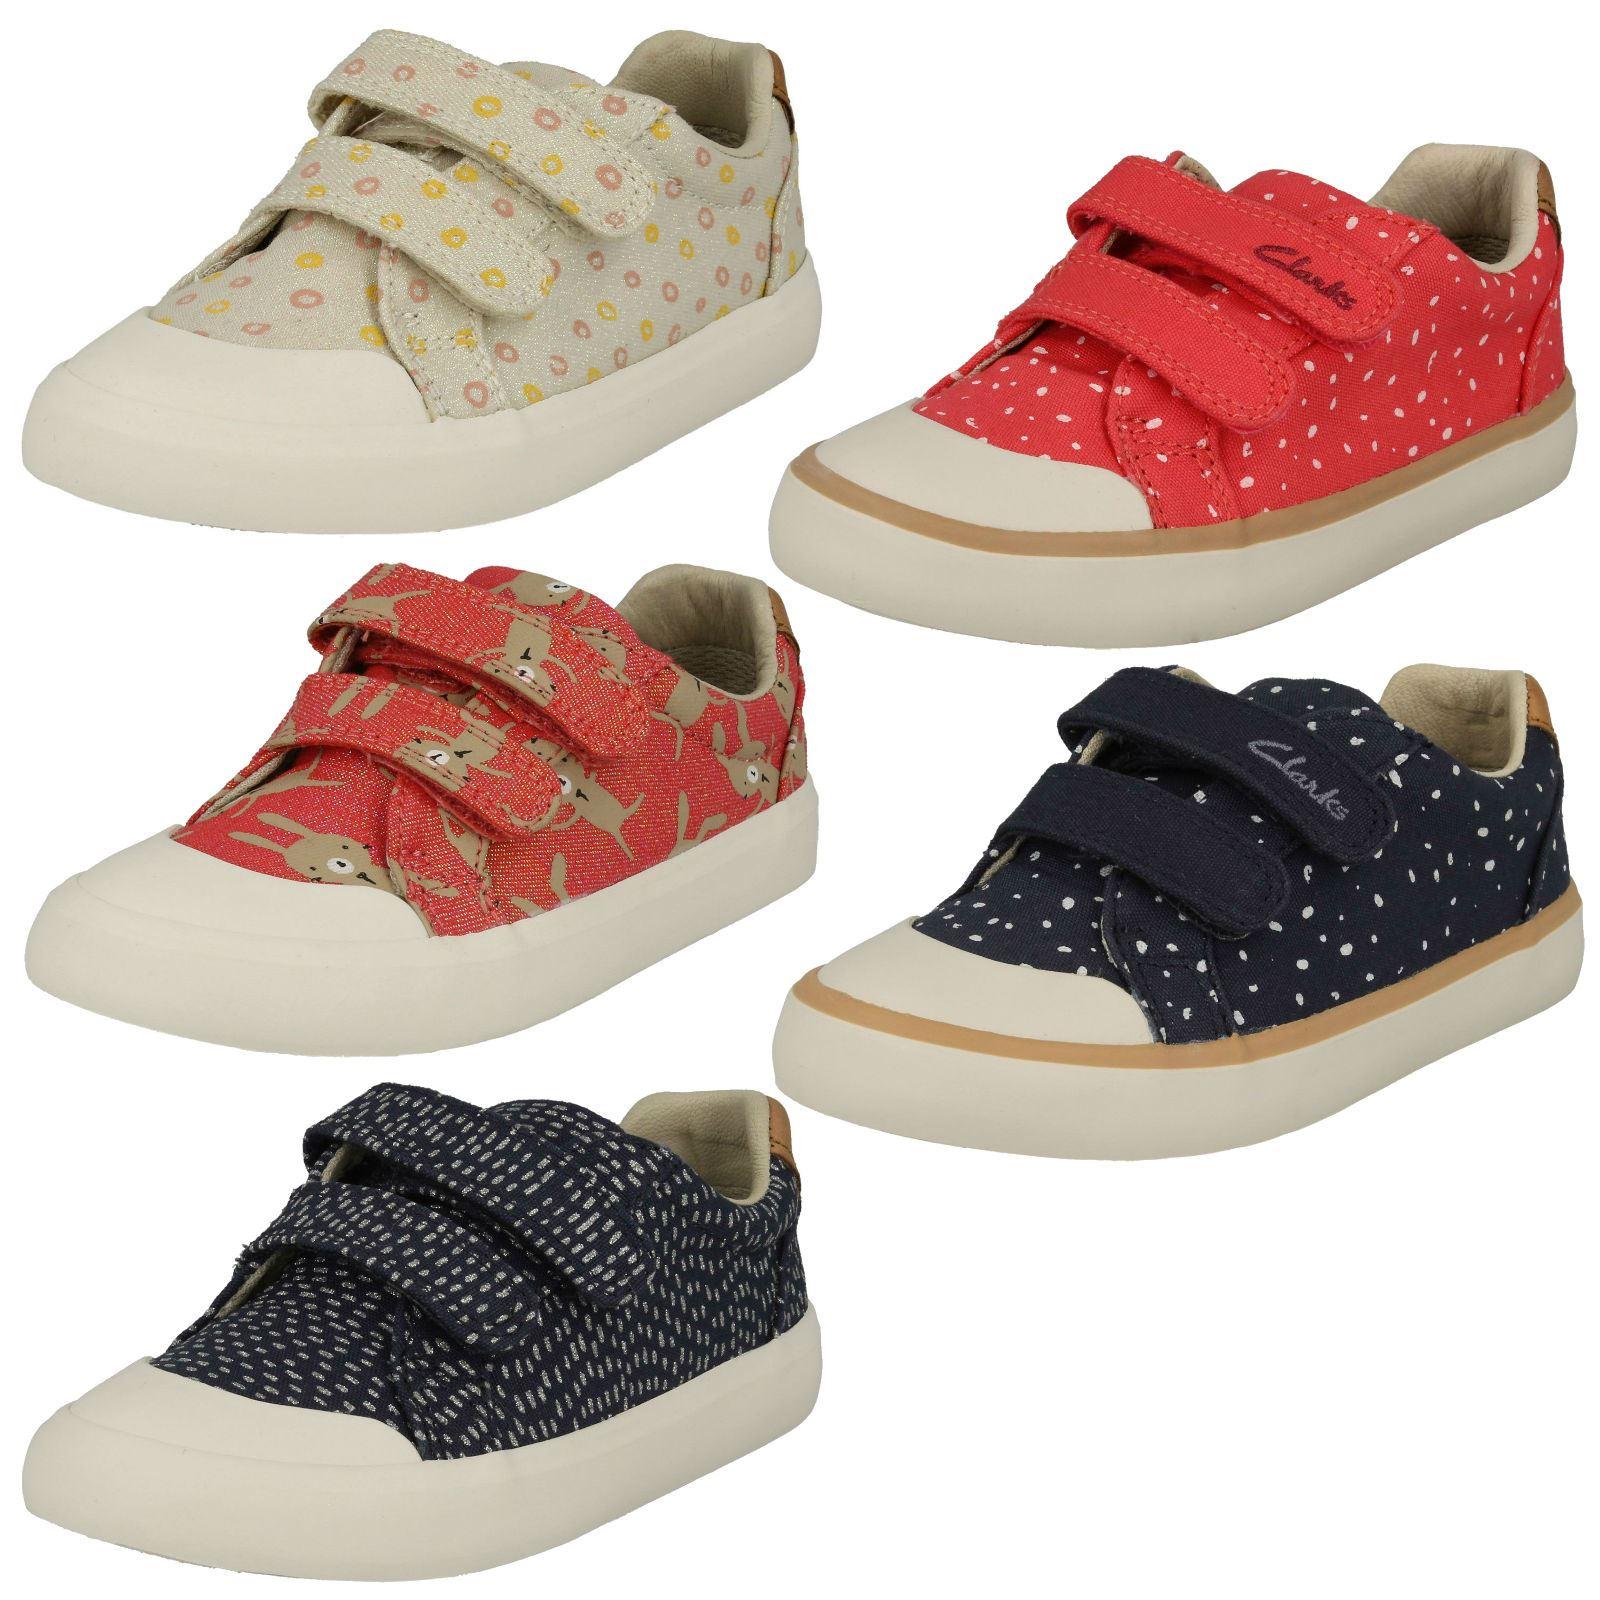 Clarks Doodles Boys Girls Fabric Velcro Fasten Shoes Baby Infant Kids